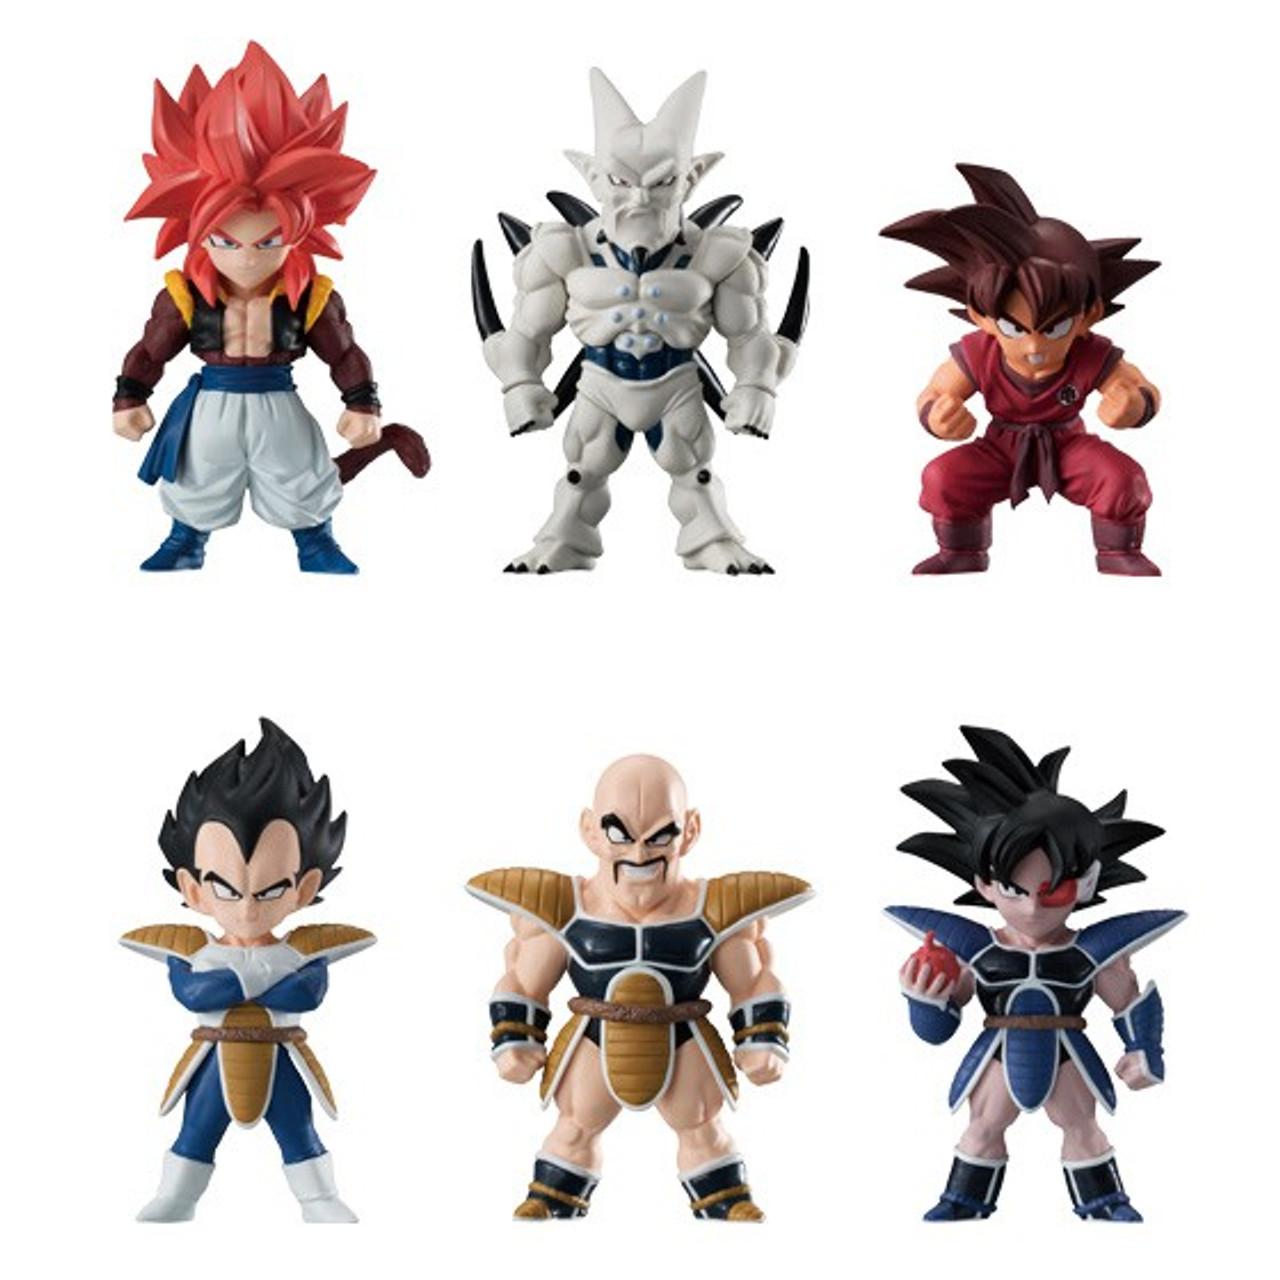 Bandai Dragon Ball Super Adverge 8 Vegeta 2 Inch Figure